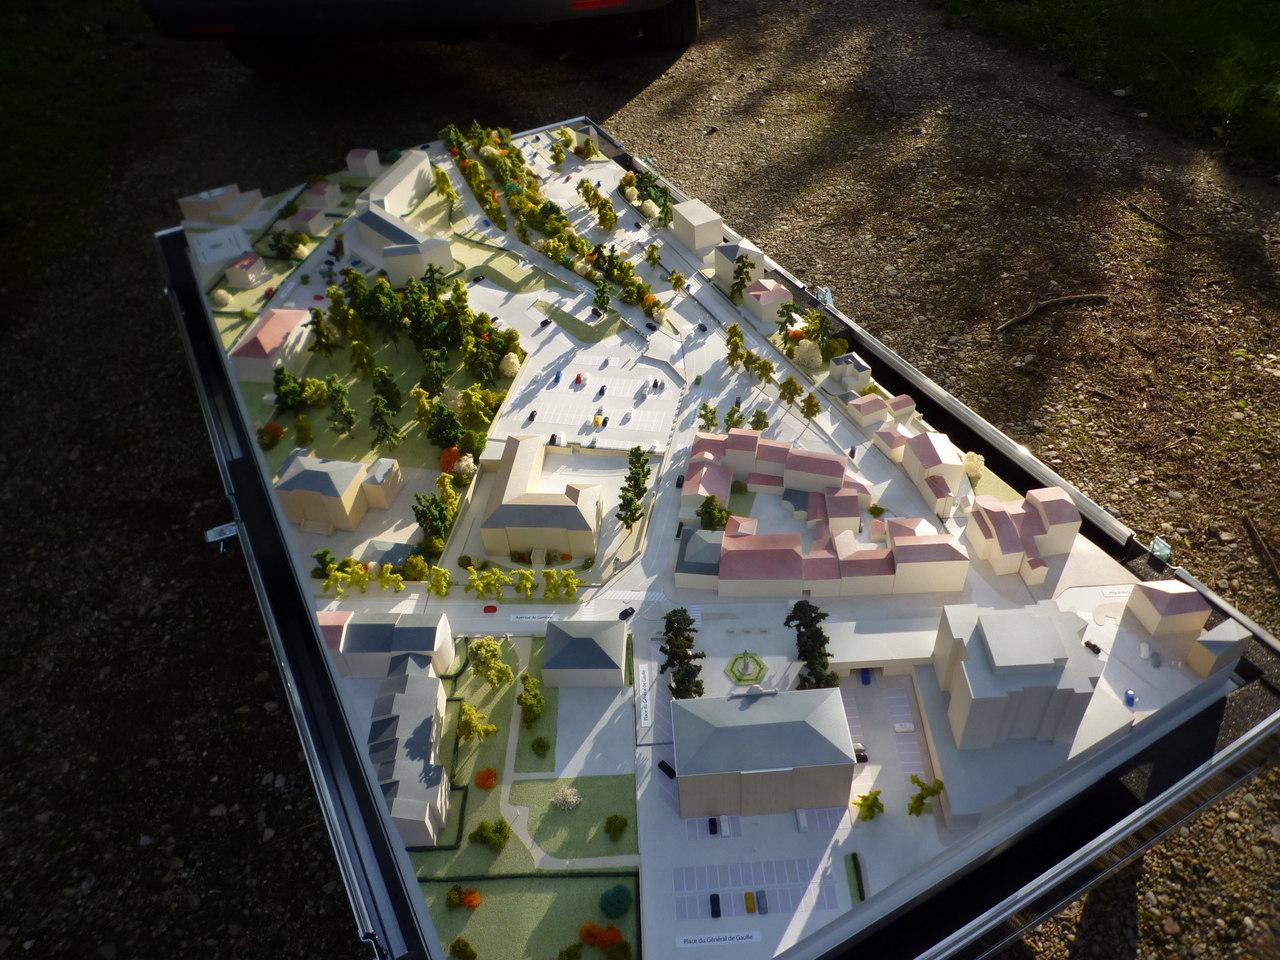 Mairie de St Julien en Genevois - 1/200